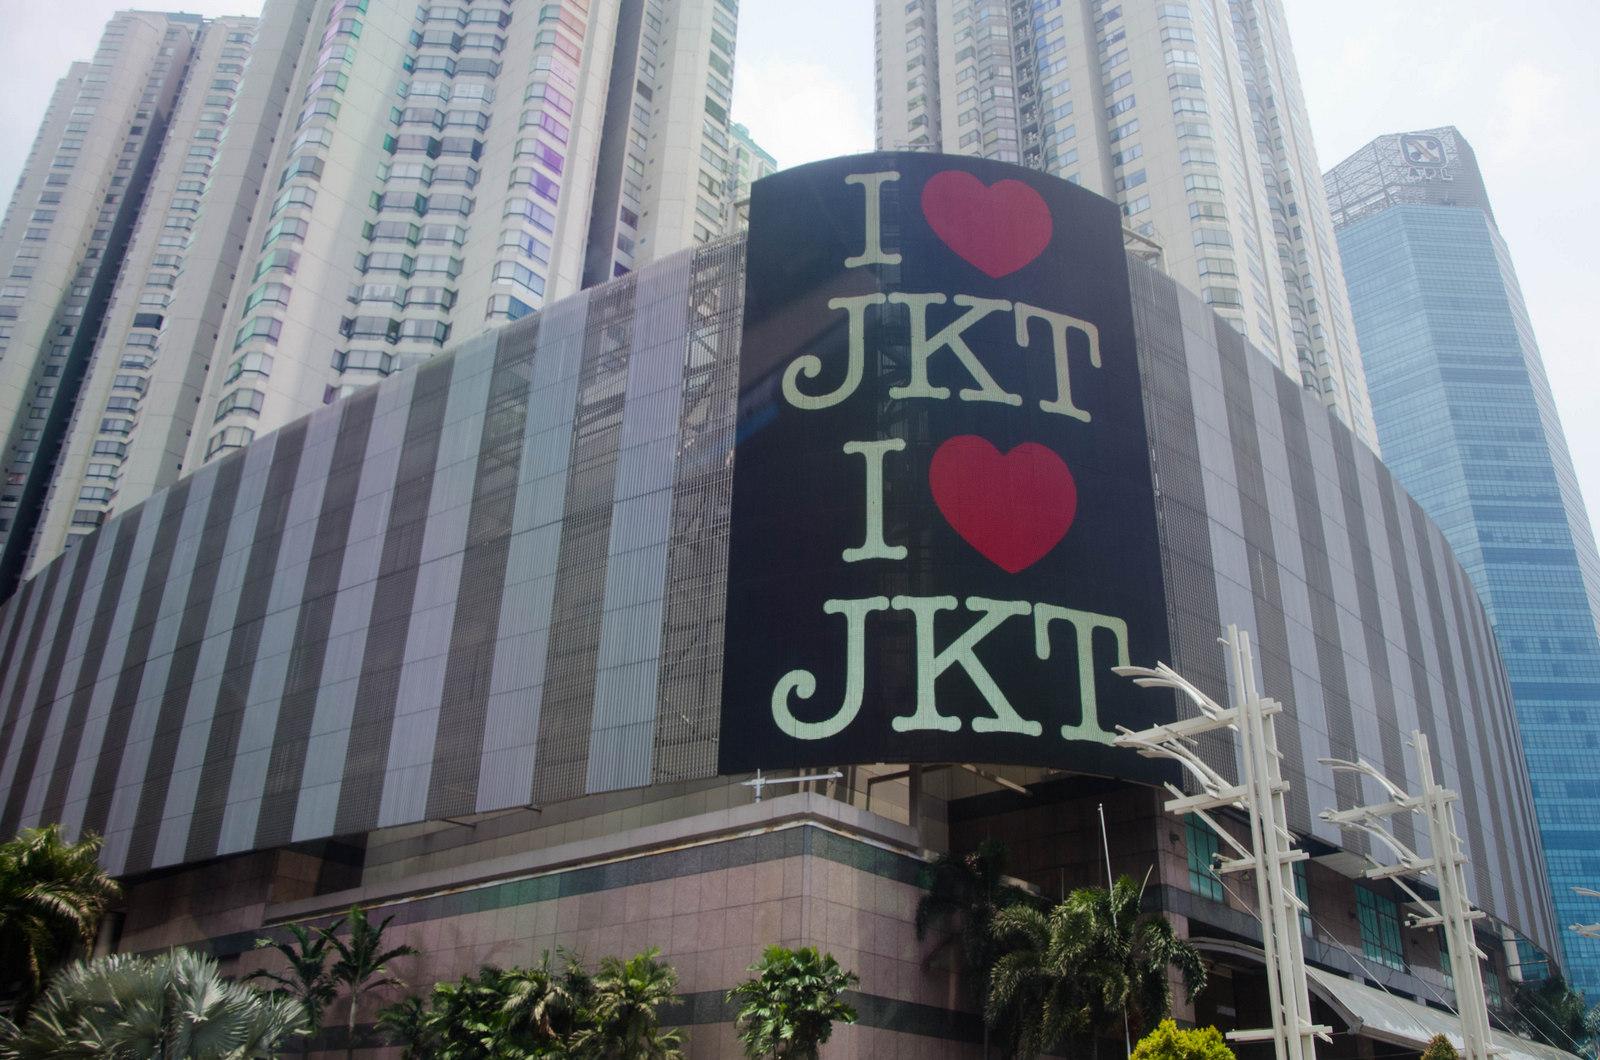 4 Wisata Non-Mall yang Asyik di Jakarta